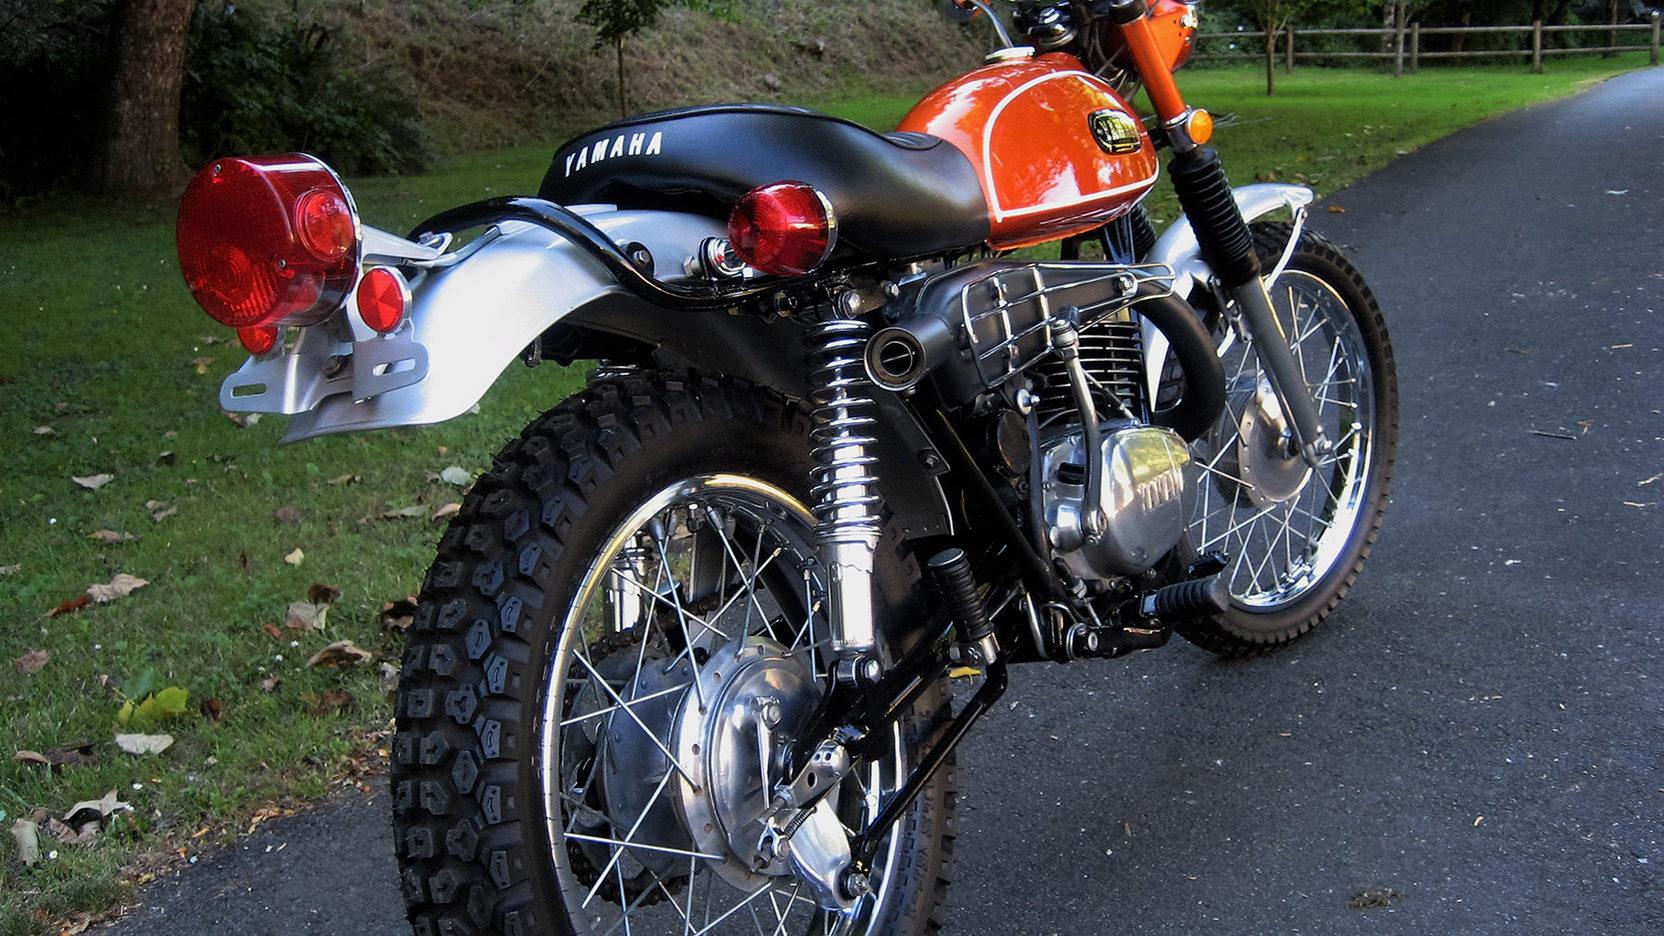 1971 Yamaha DT1E | T200 | Las Vegas Motorcycle 2017